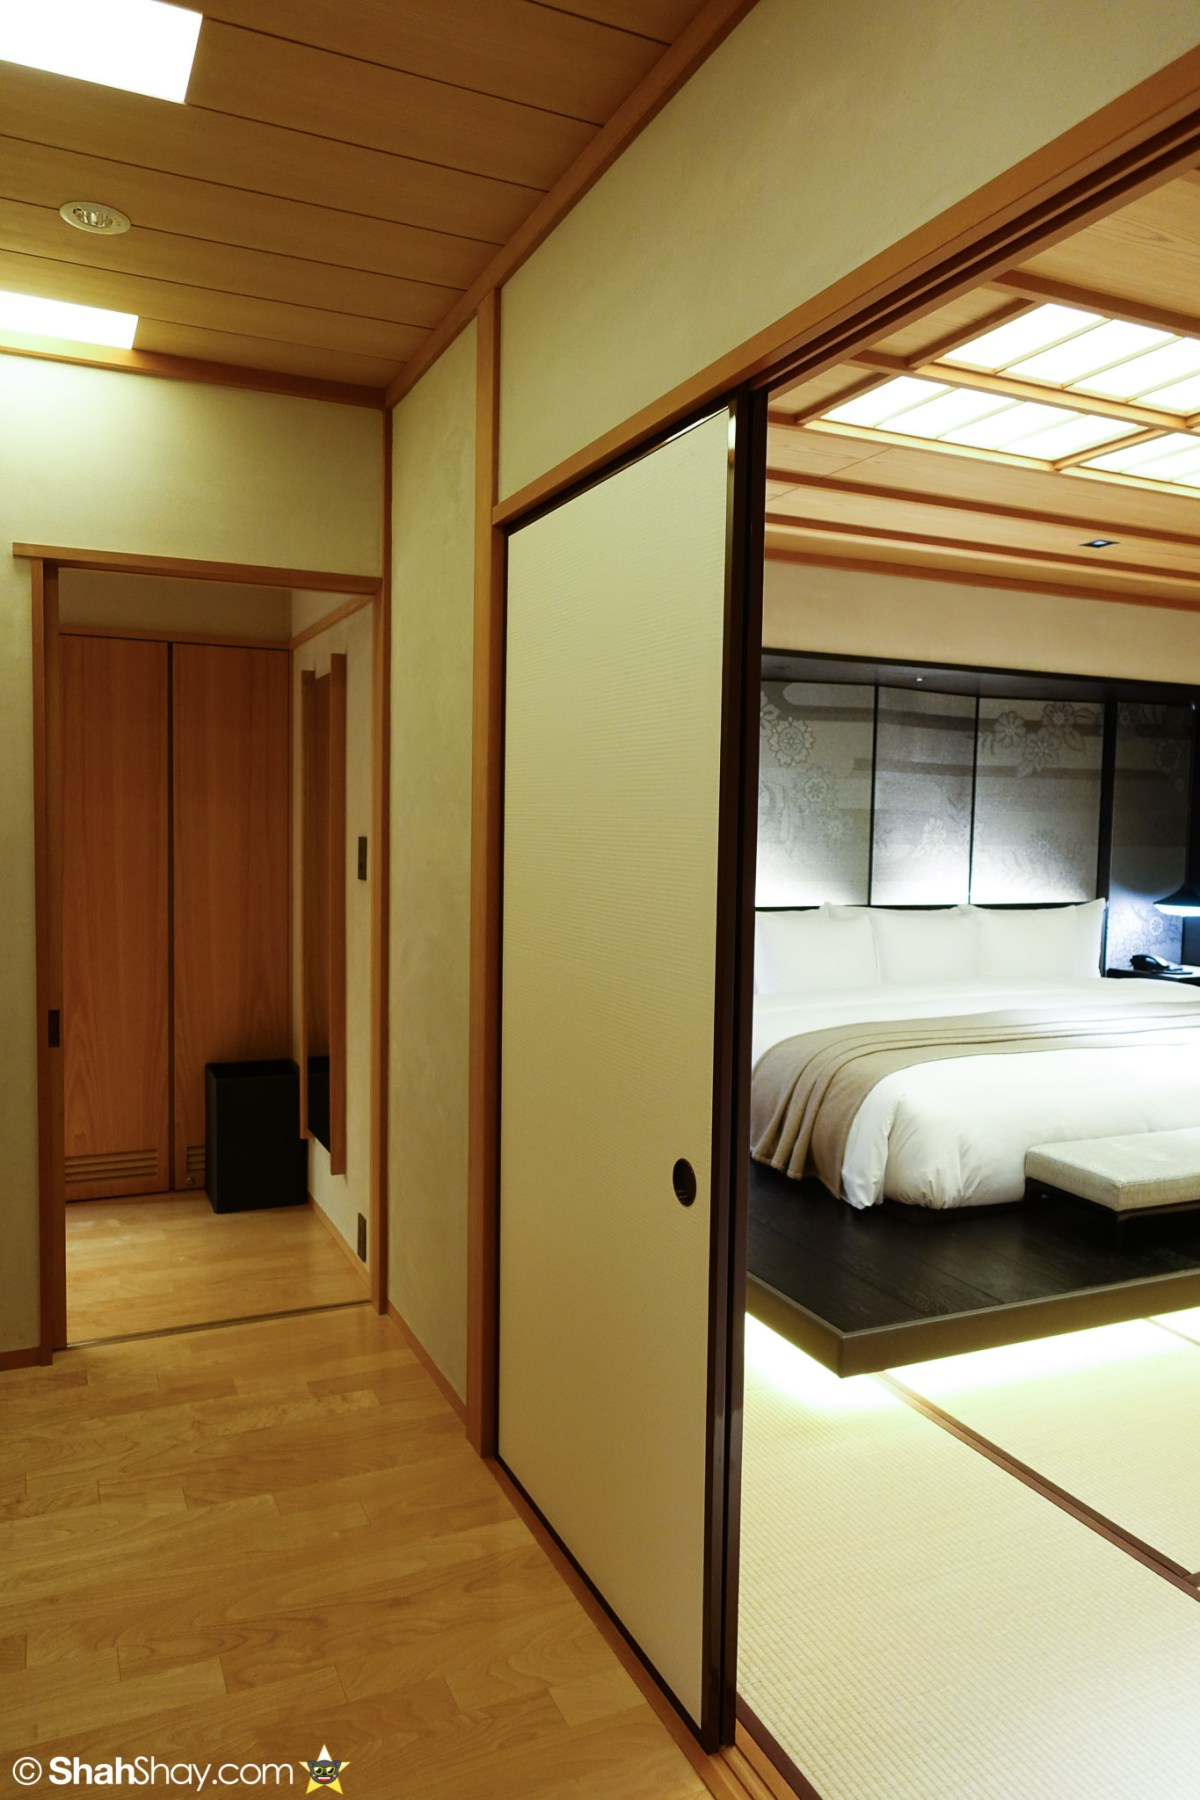 The Ritz-Carlton Tokyo Rooms - Modern Japanese Suite - Hallway